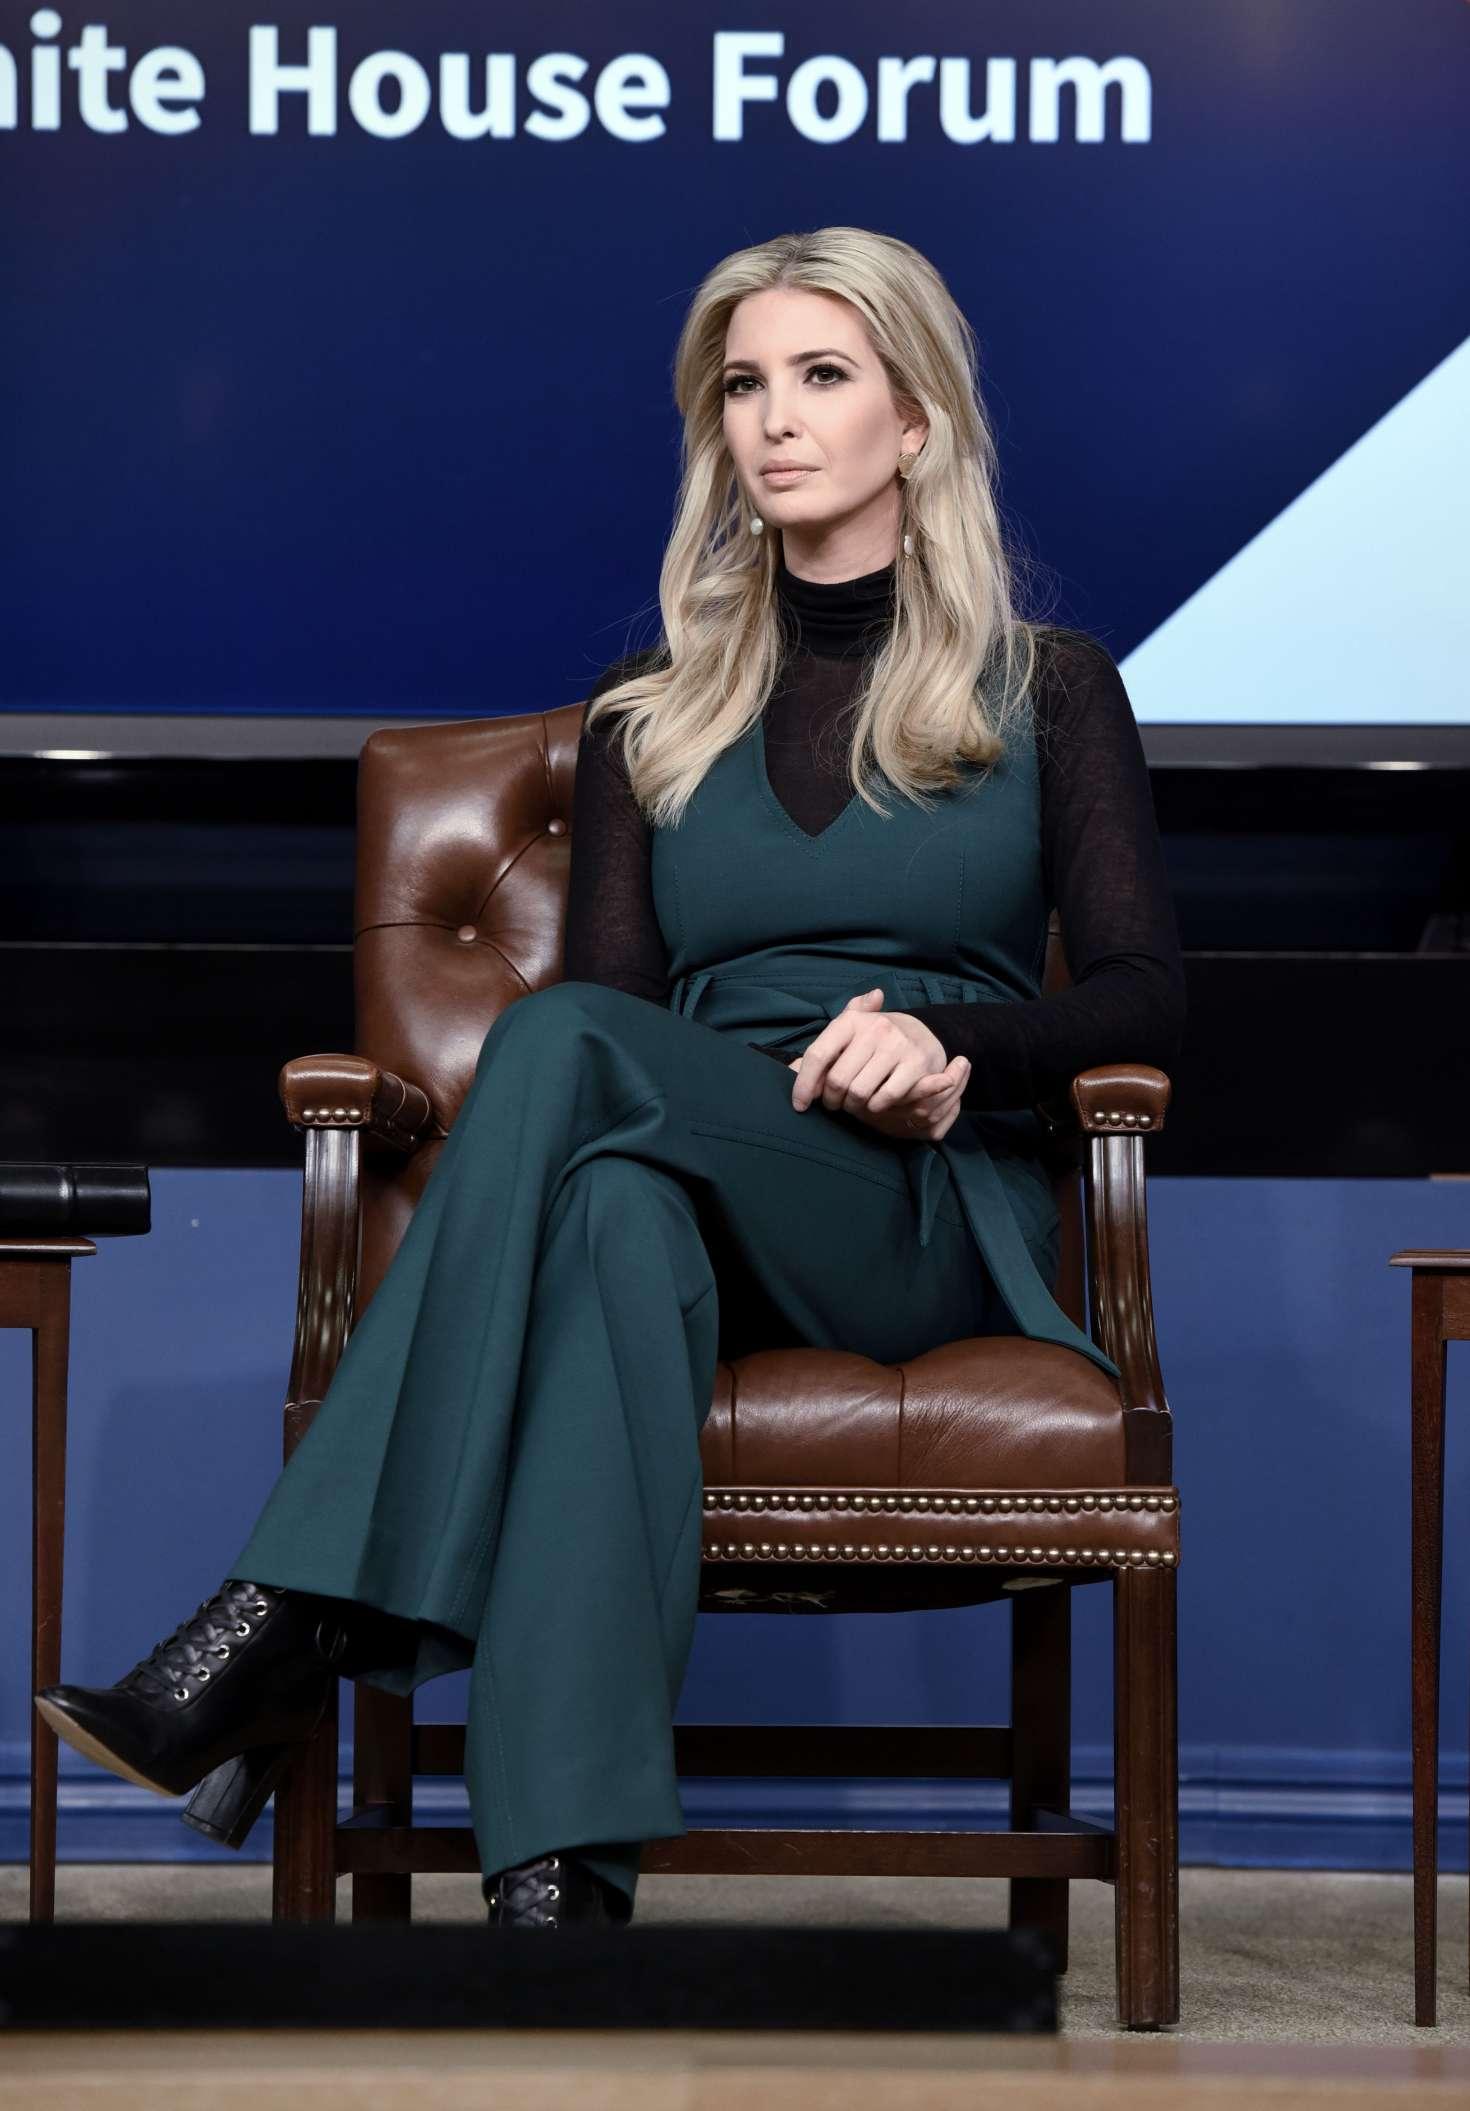 Ivanka Trump 2018 : Ivanka Trump: Generation Next: A White House Forum -05